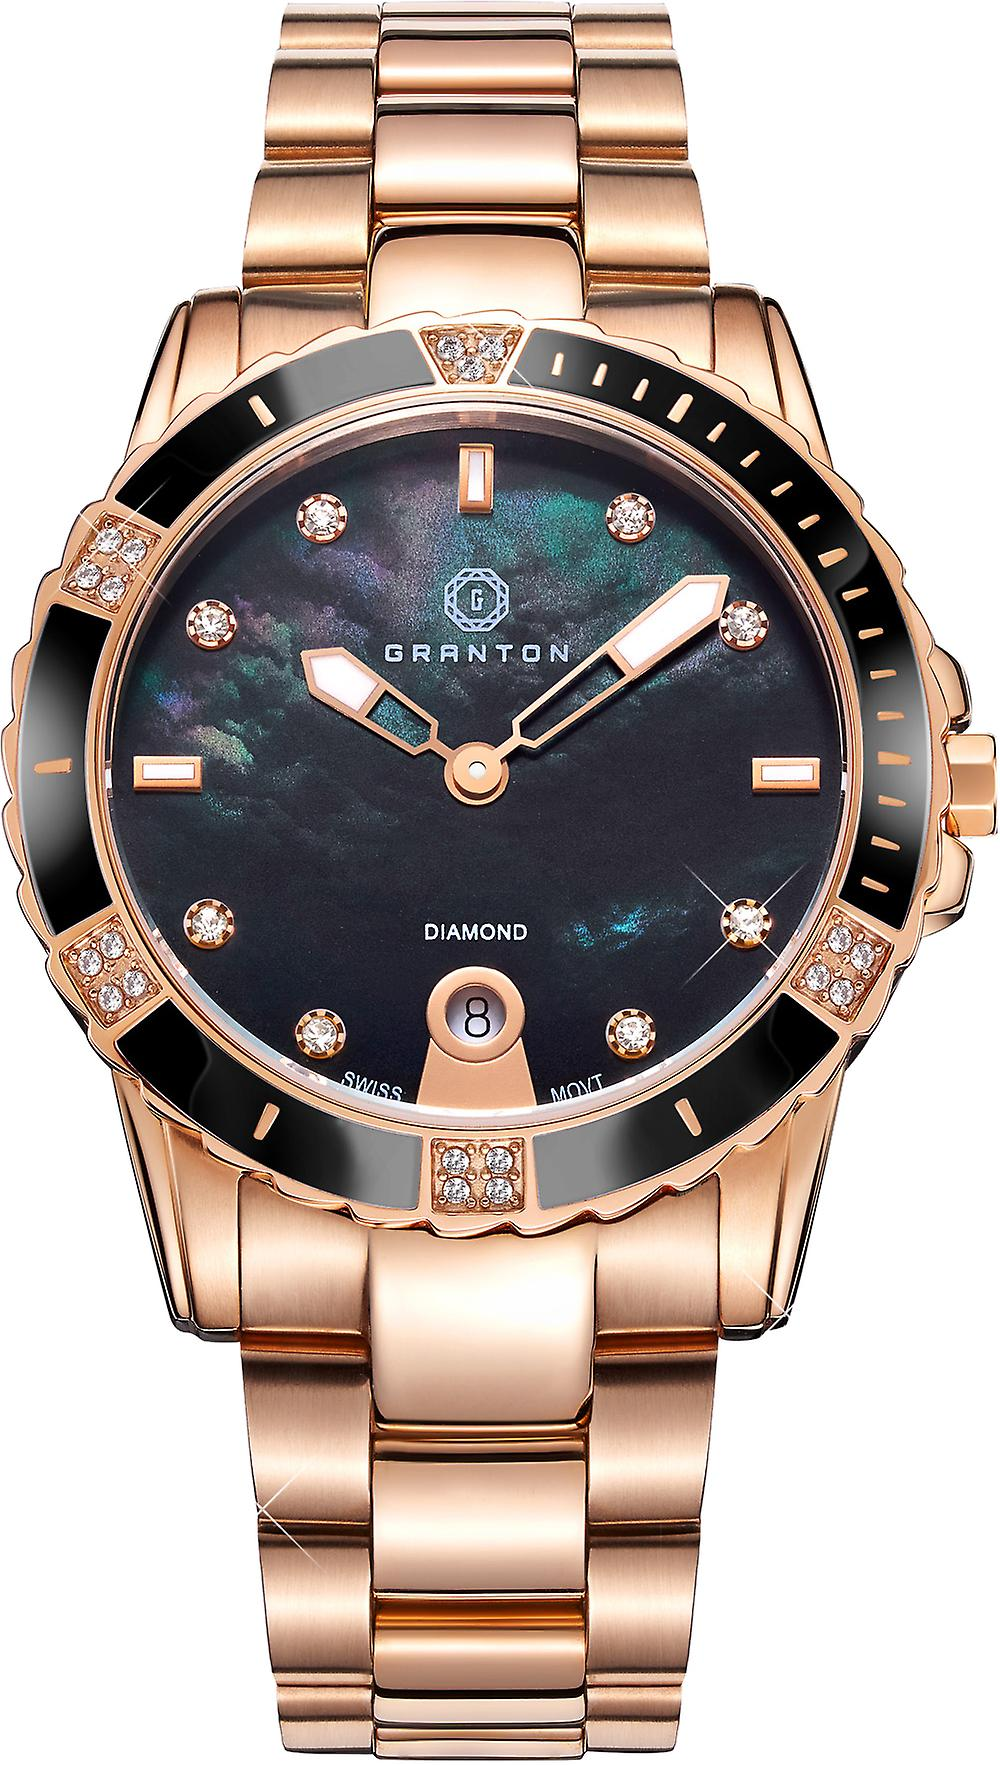 Granton - Influence - Women's Watch - Black Rose Gold